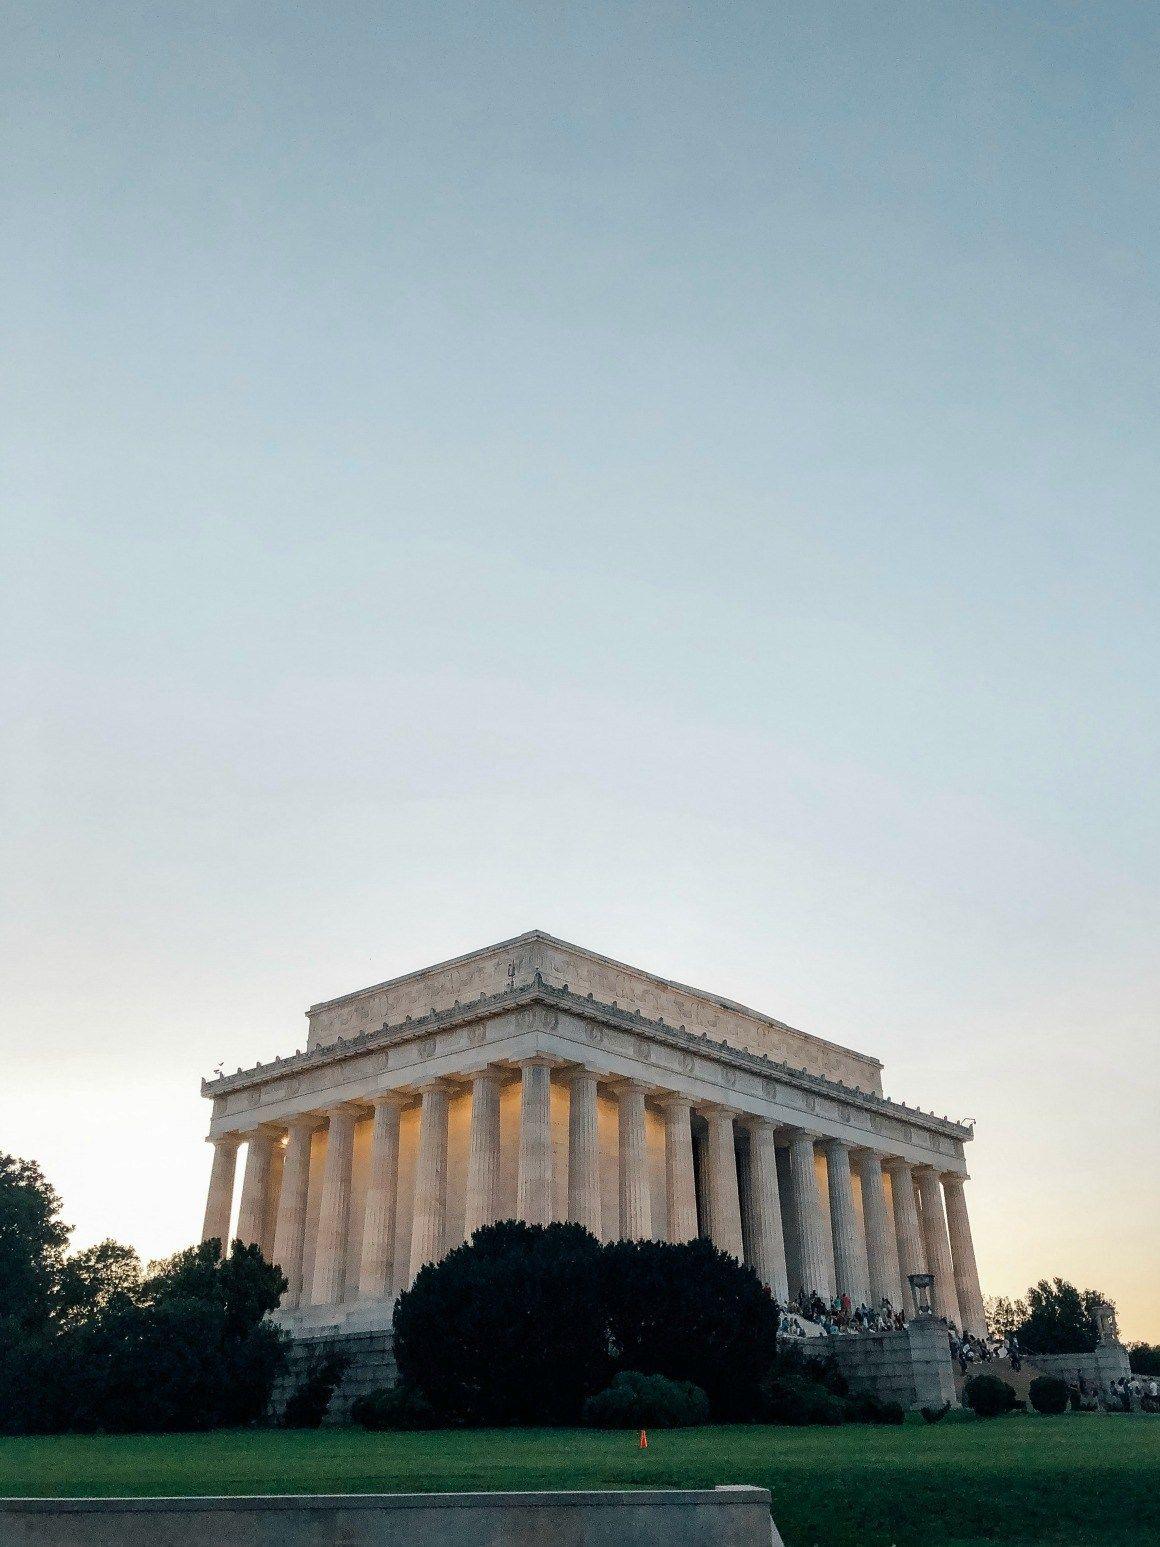 Washington Dc Top Things To Do With Printable